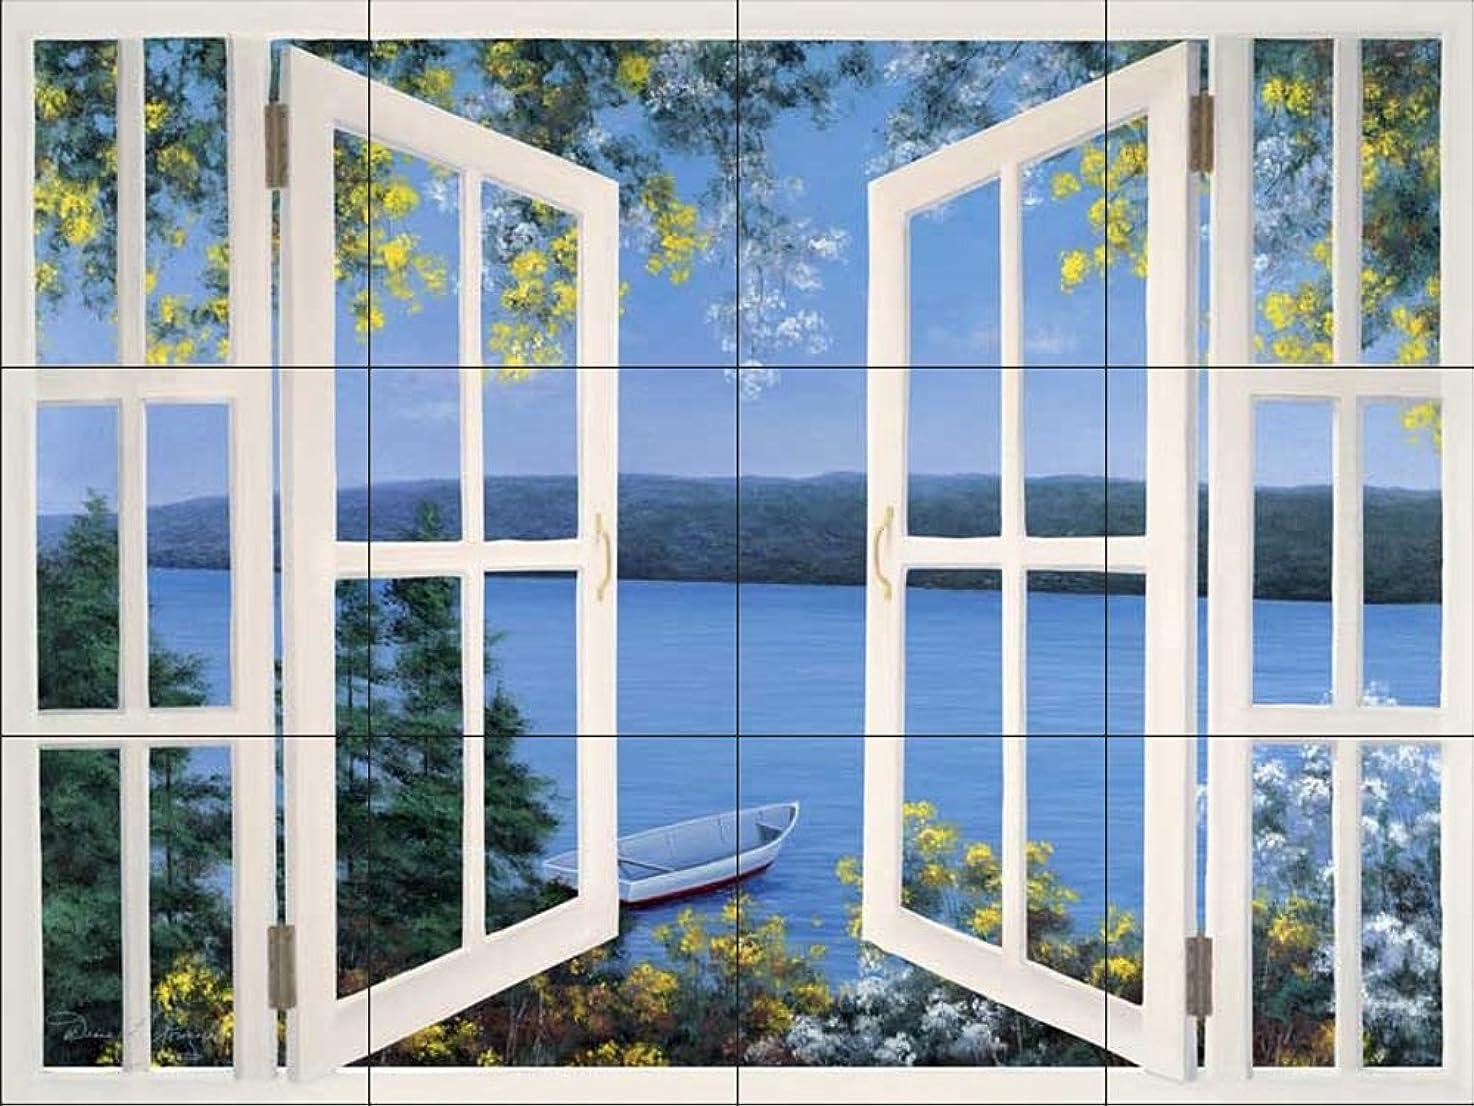 Ceramic Tile Mural - DR-Island Time with Window - by Diane Romanello - Kitchen backsplash/Bathroom Shower